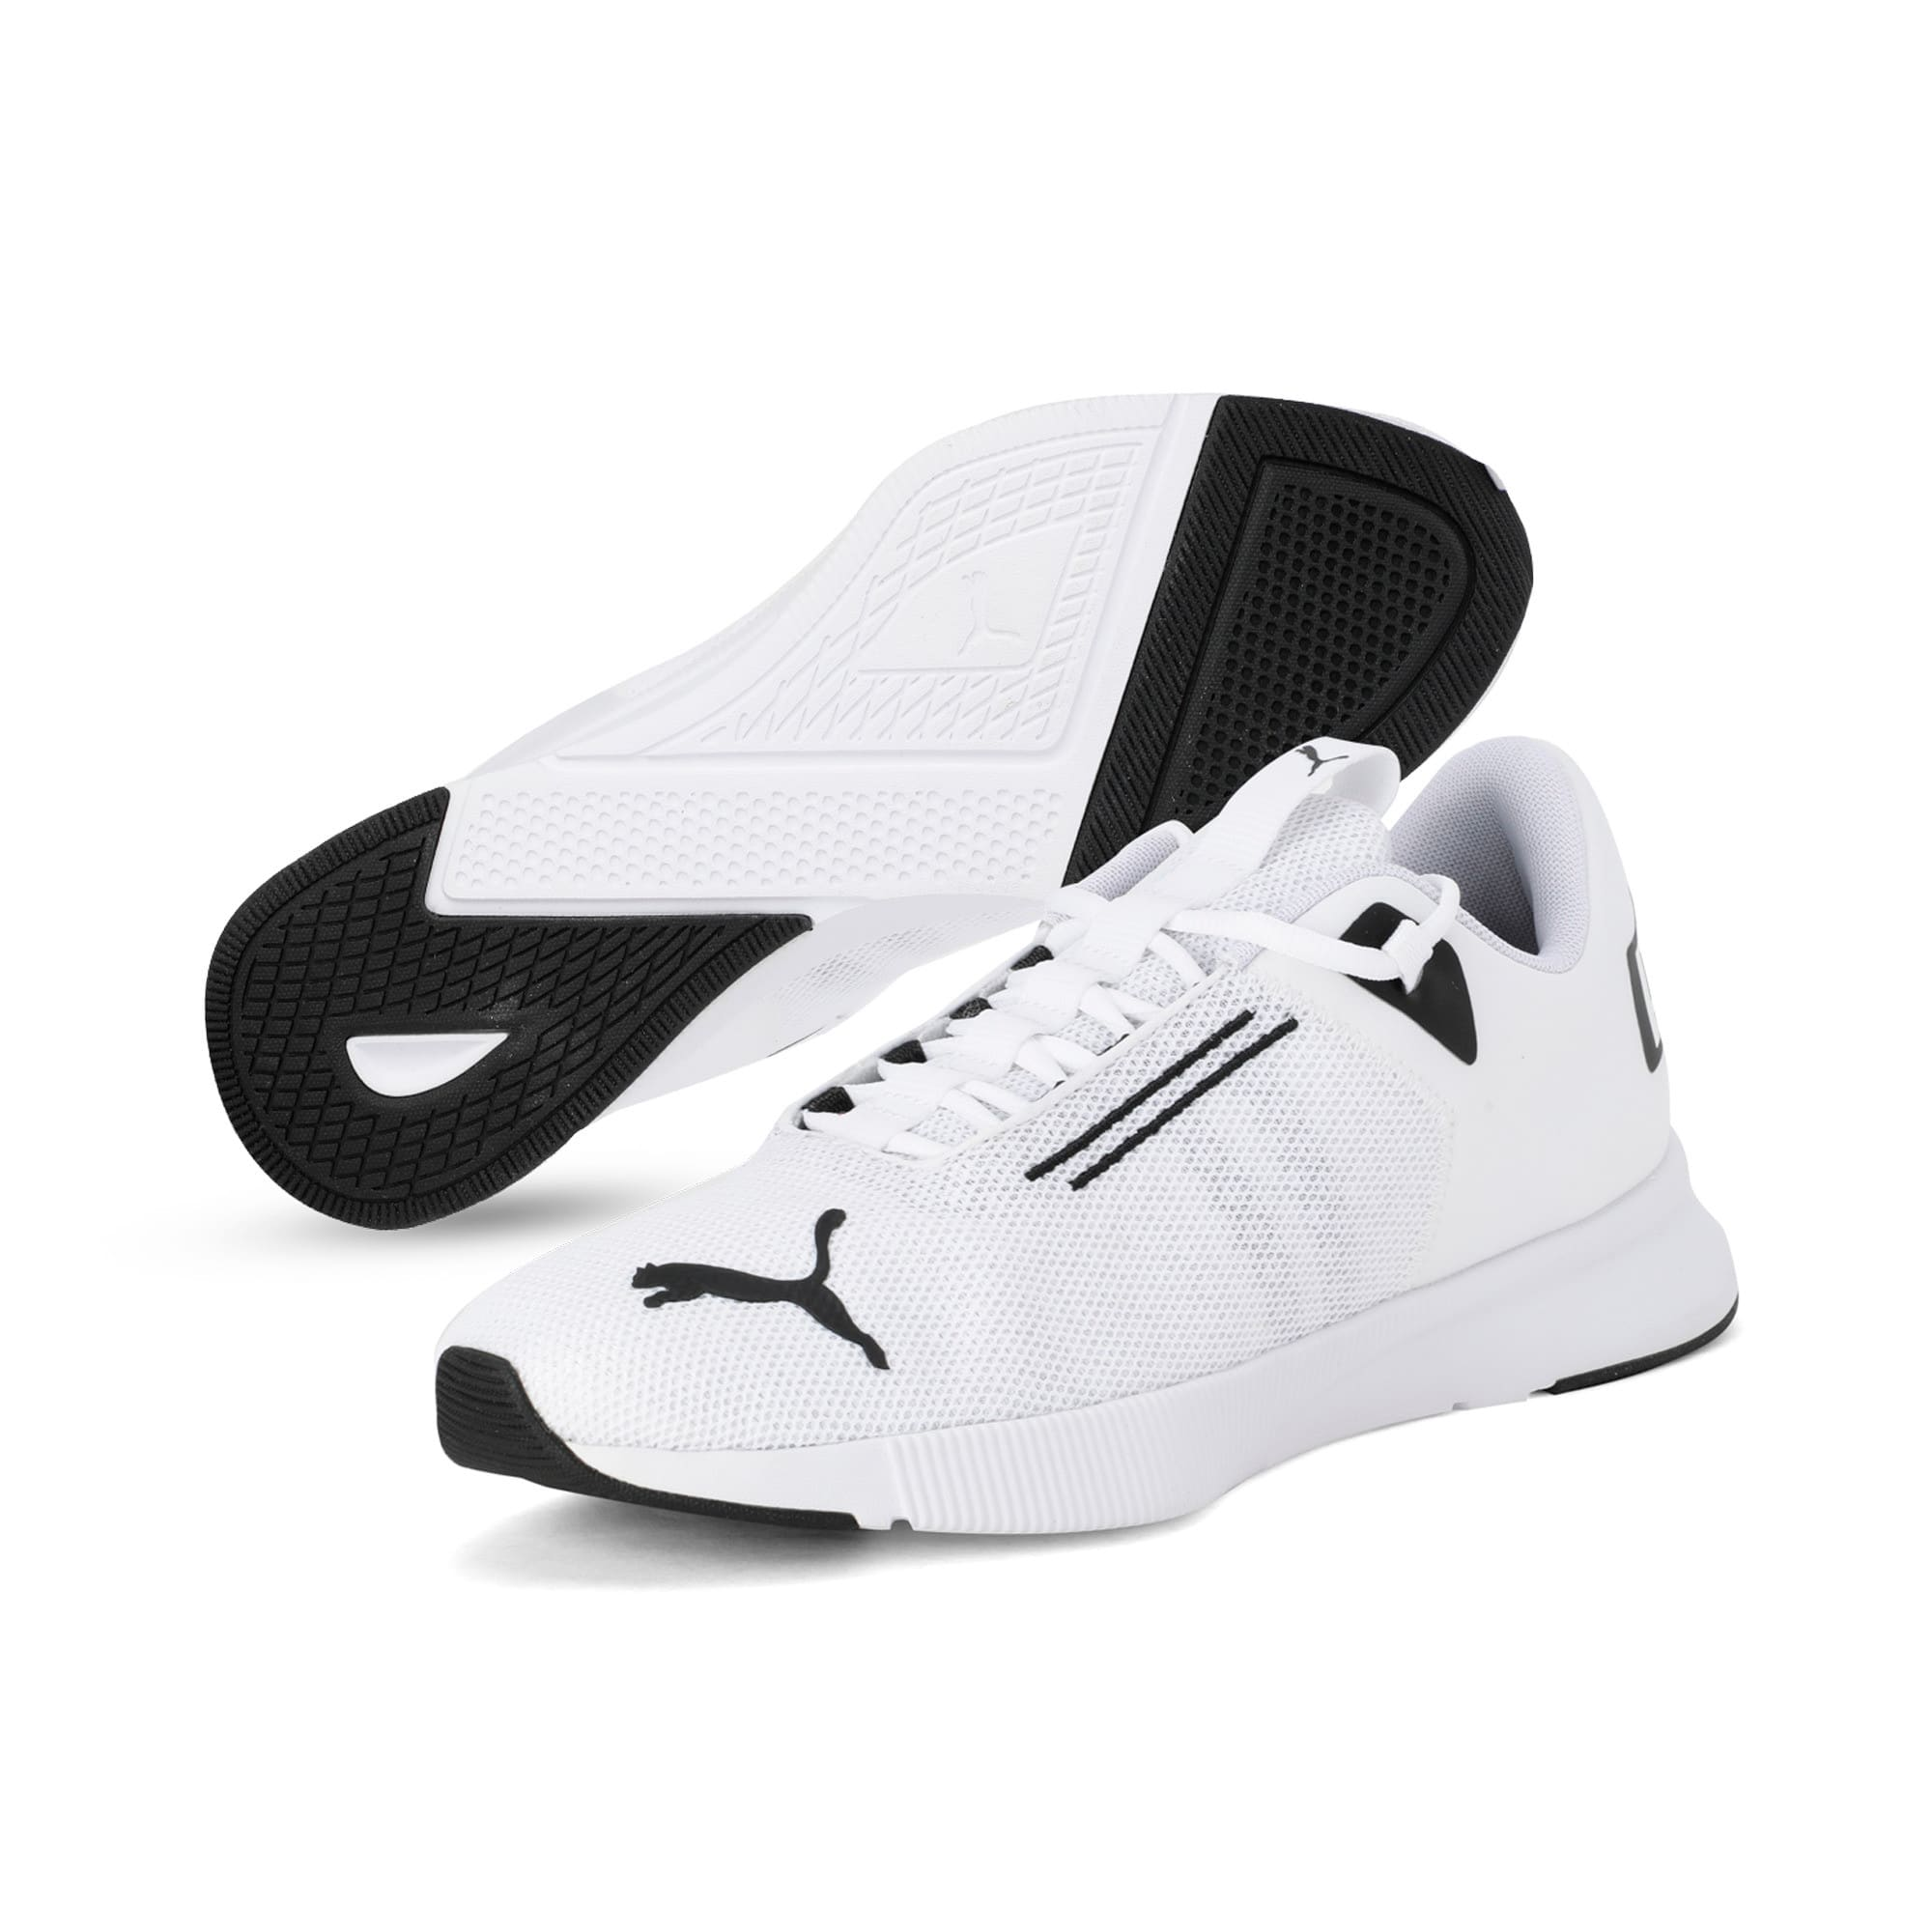 Thumbnail 2 of Flyer Modern Running Shoes, Puma White-Puma Black, medium-IND